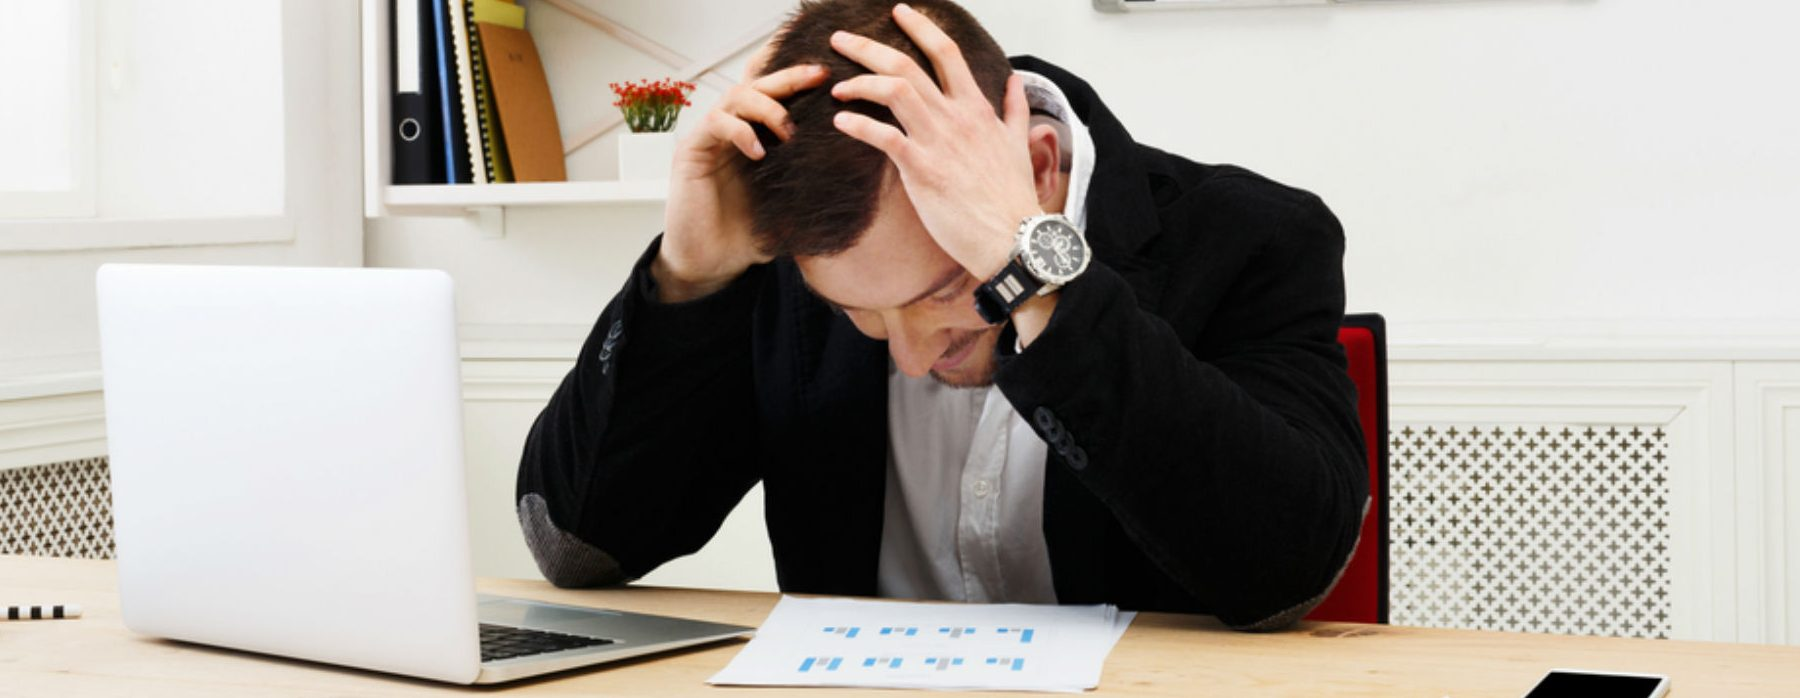 El 'síndrome de burnout': la amenaza de los millennials